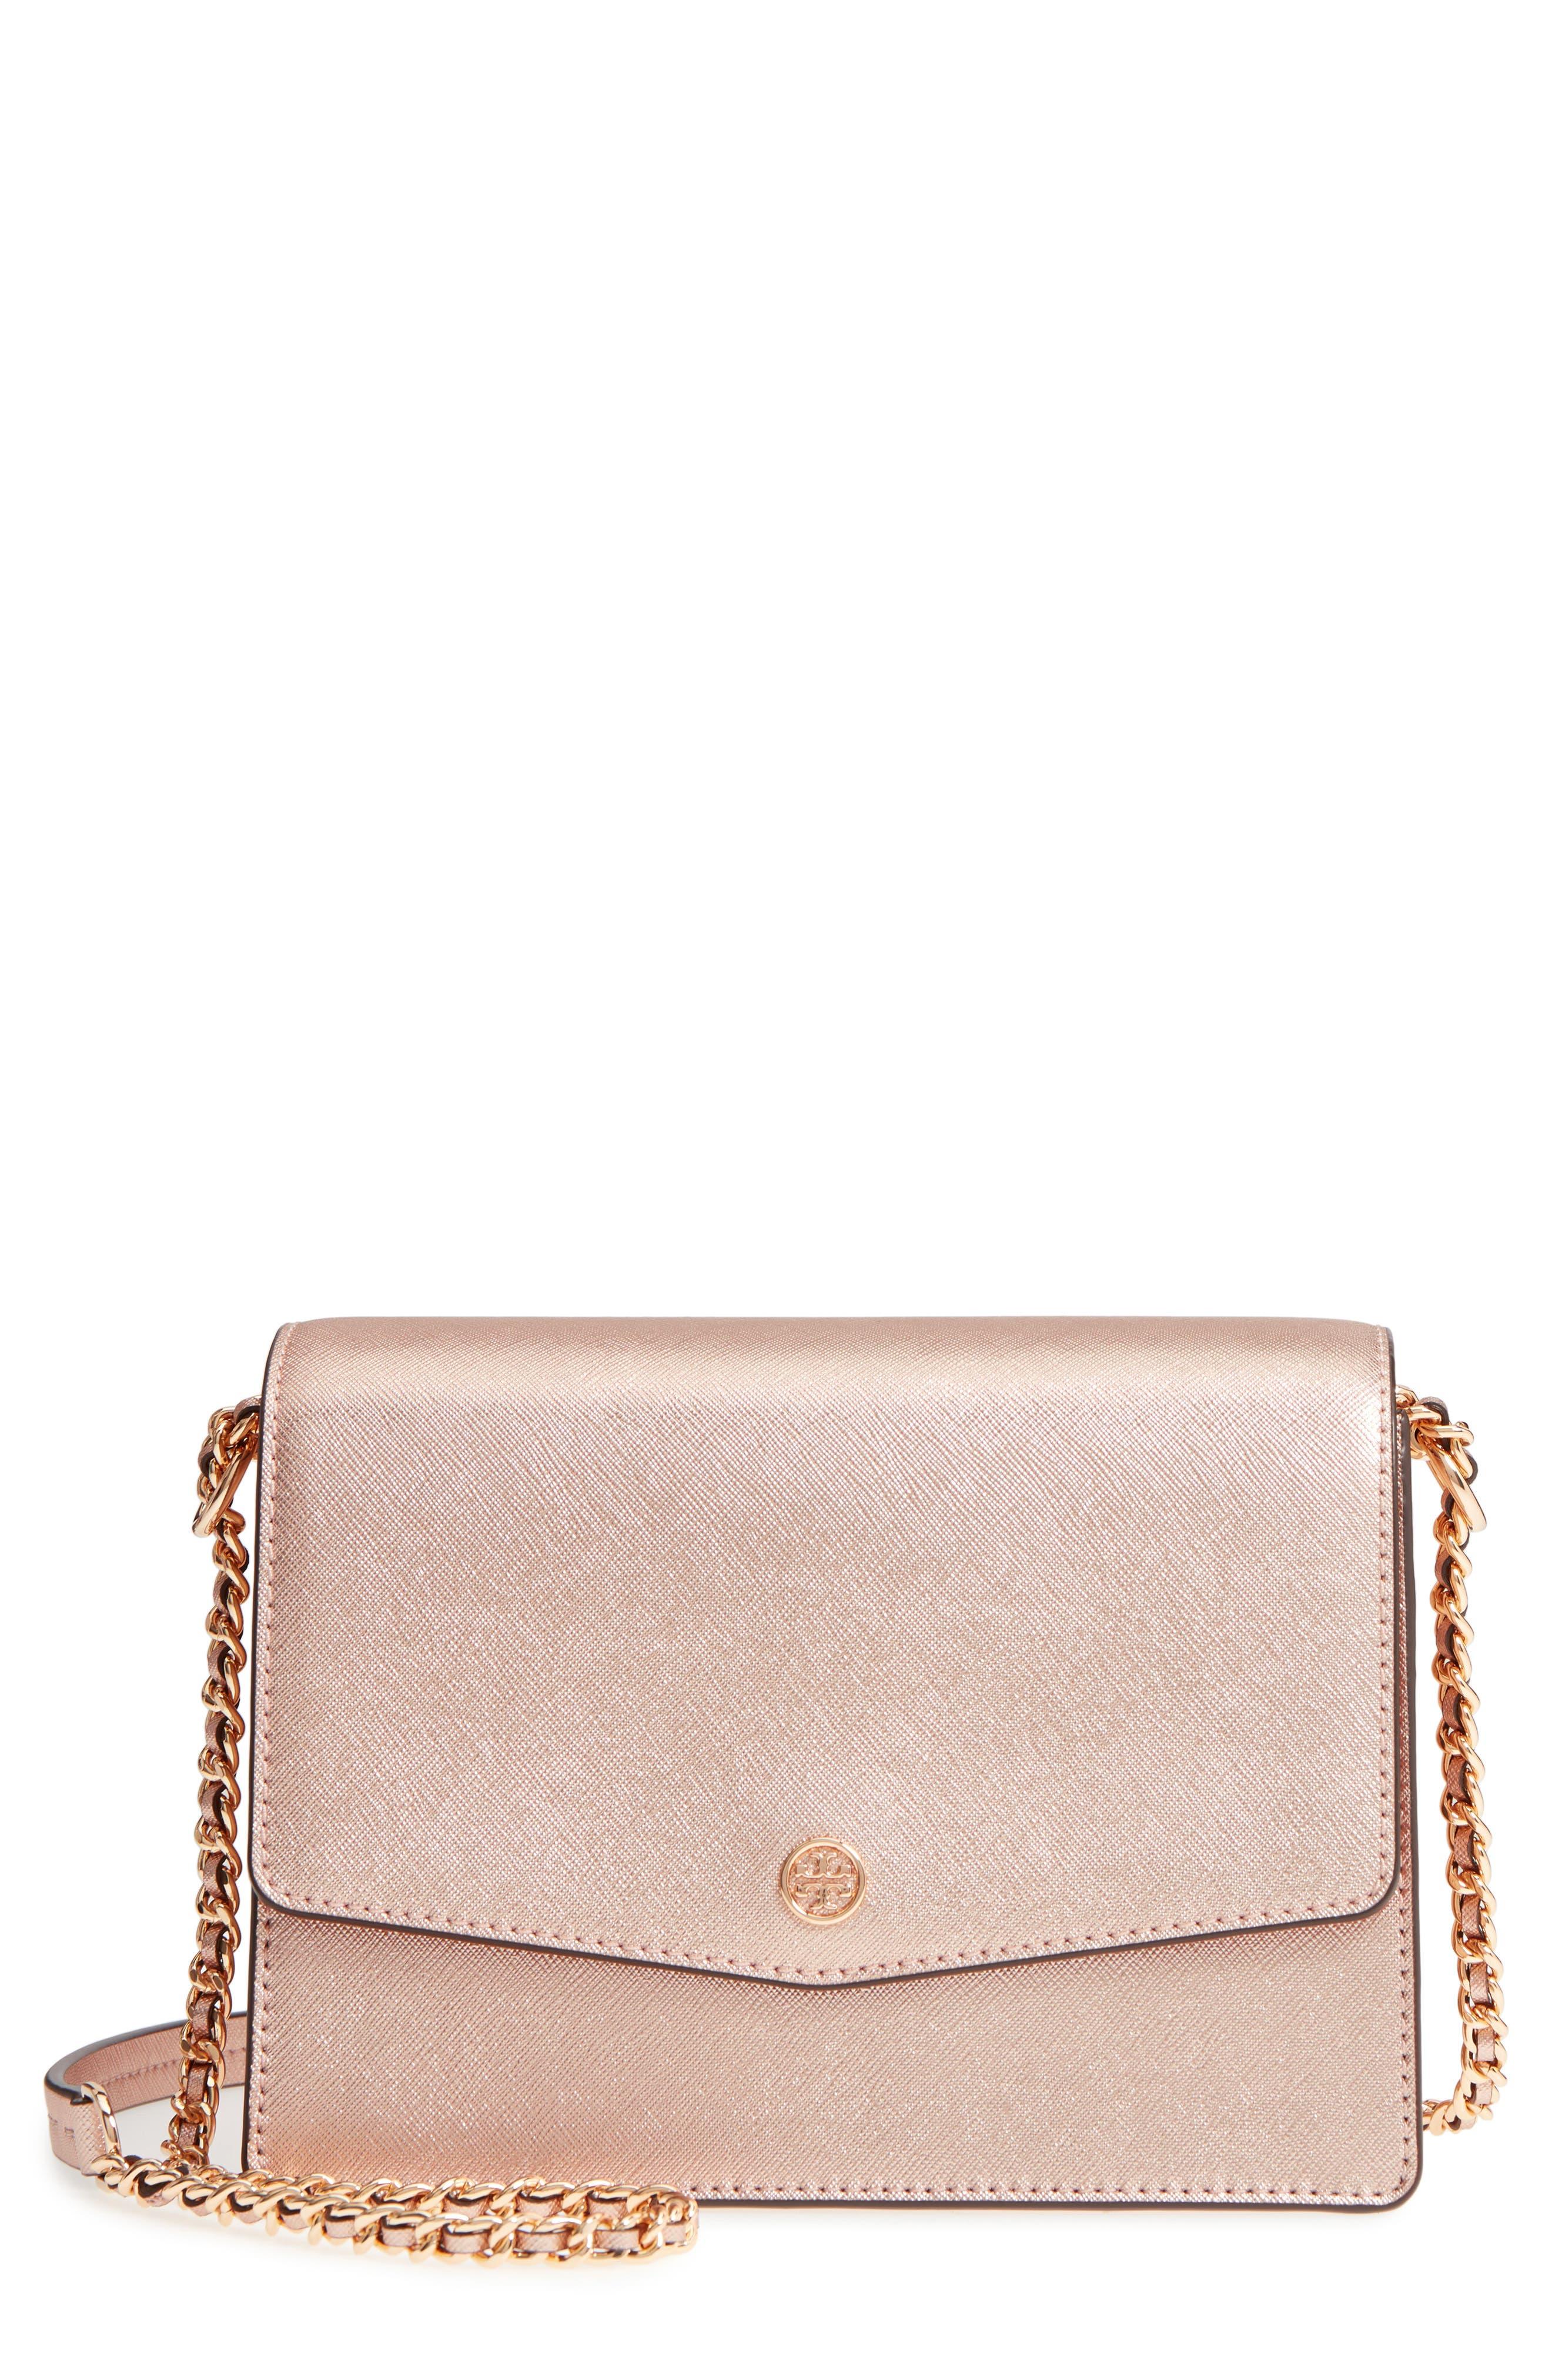 Robinson Convertible Metallic Leather Shoulder Bag,                             Main thumbnail 1, color,                             LIGHT ROSE GOLD